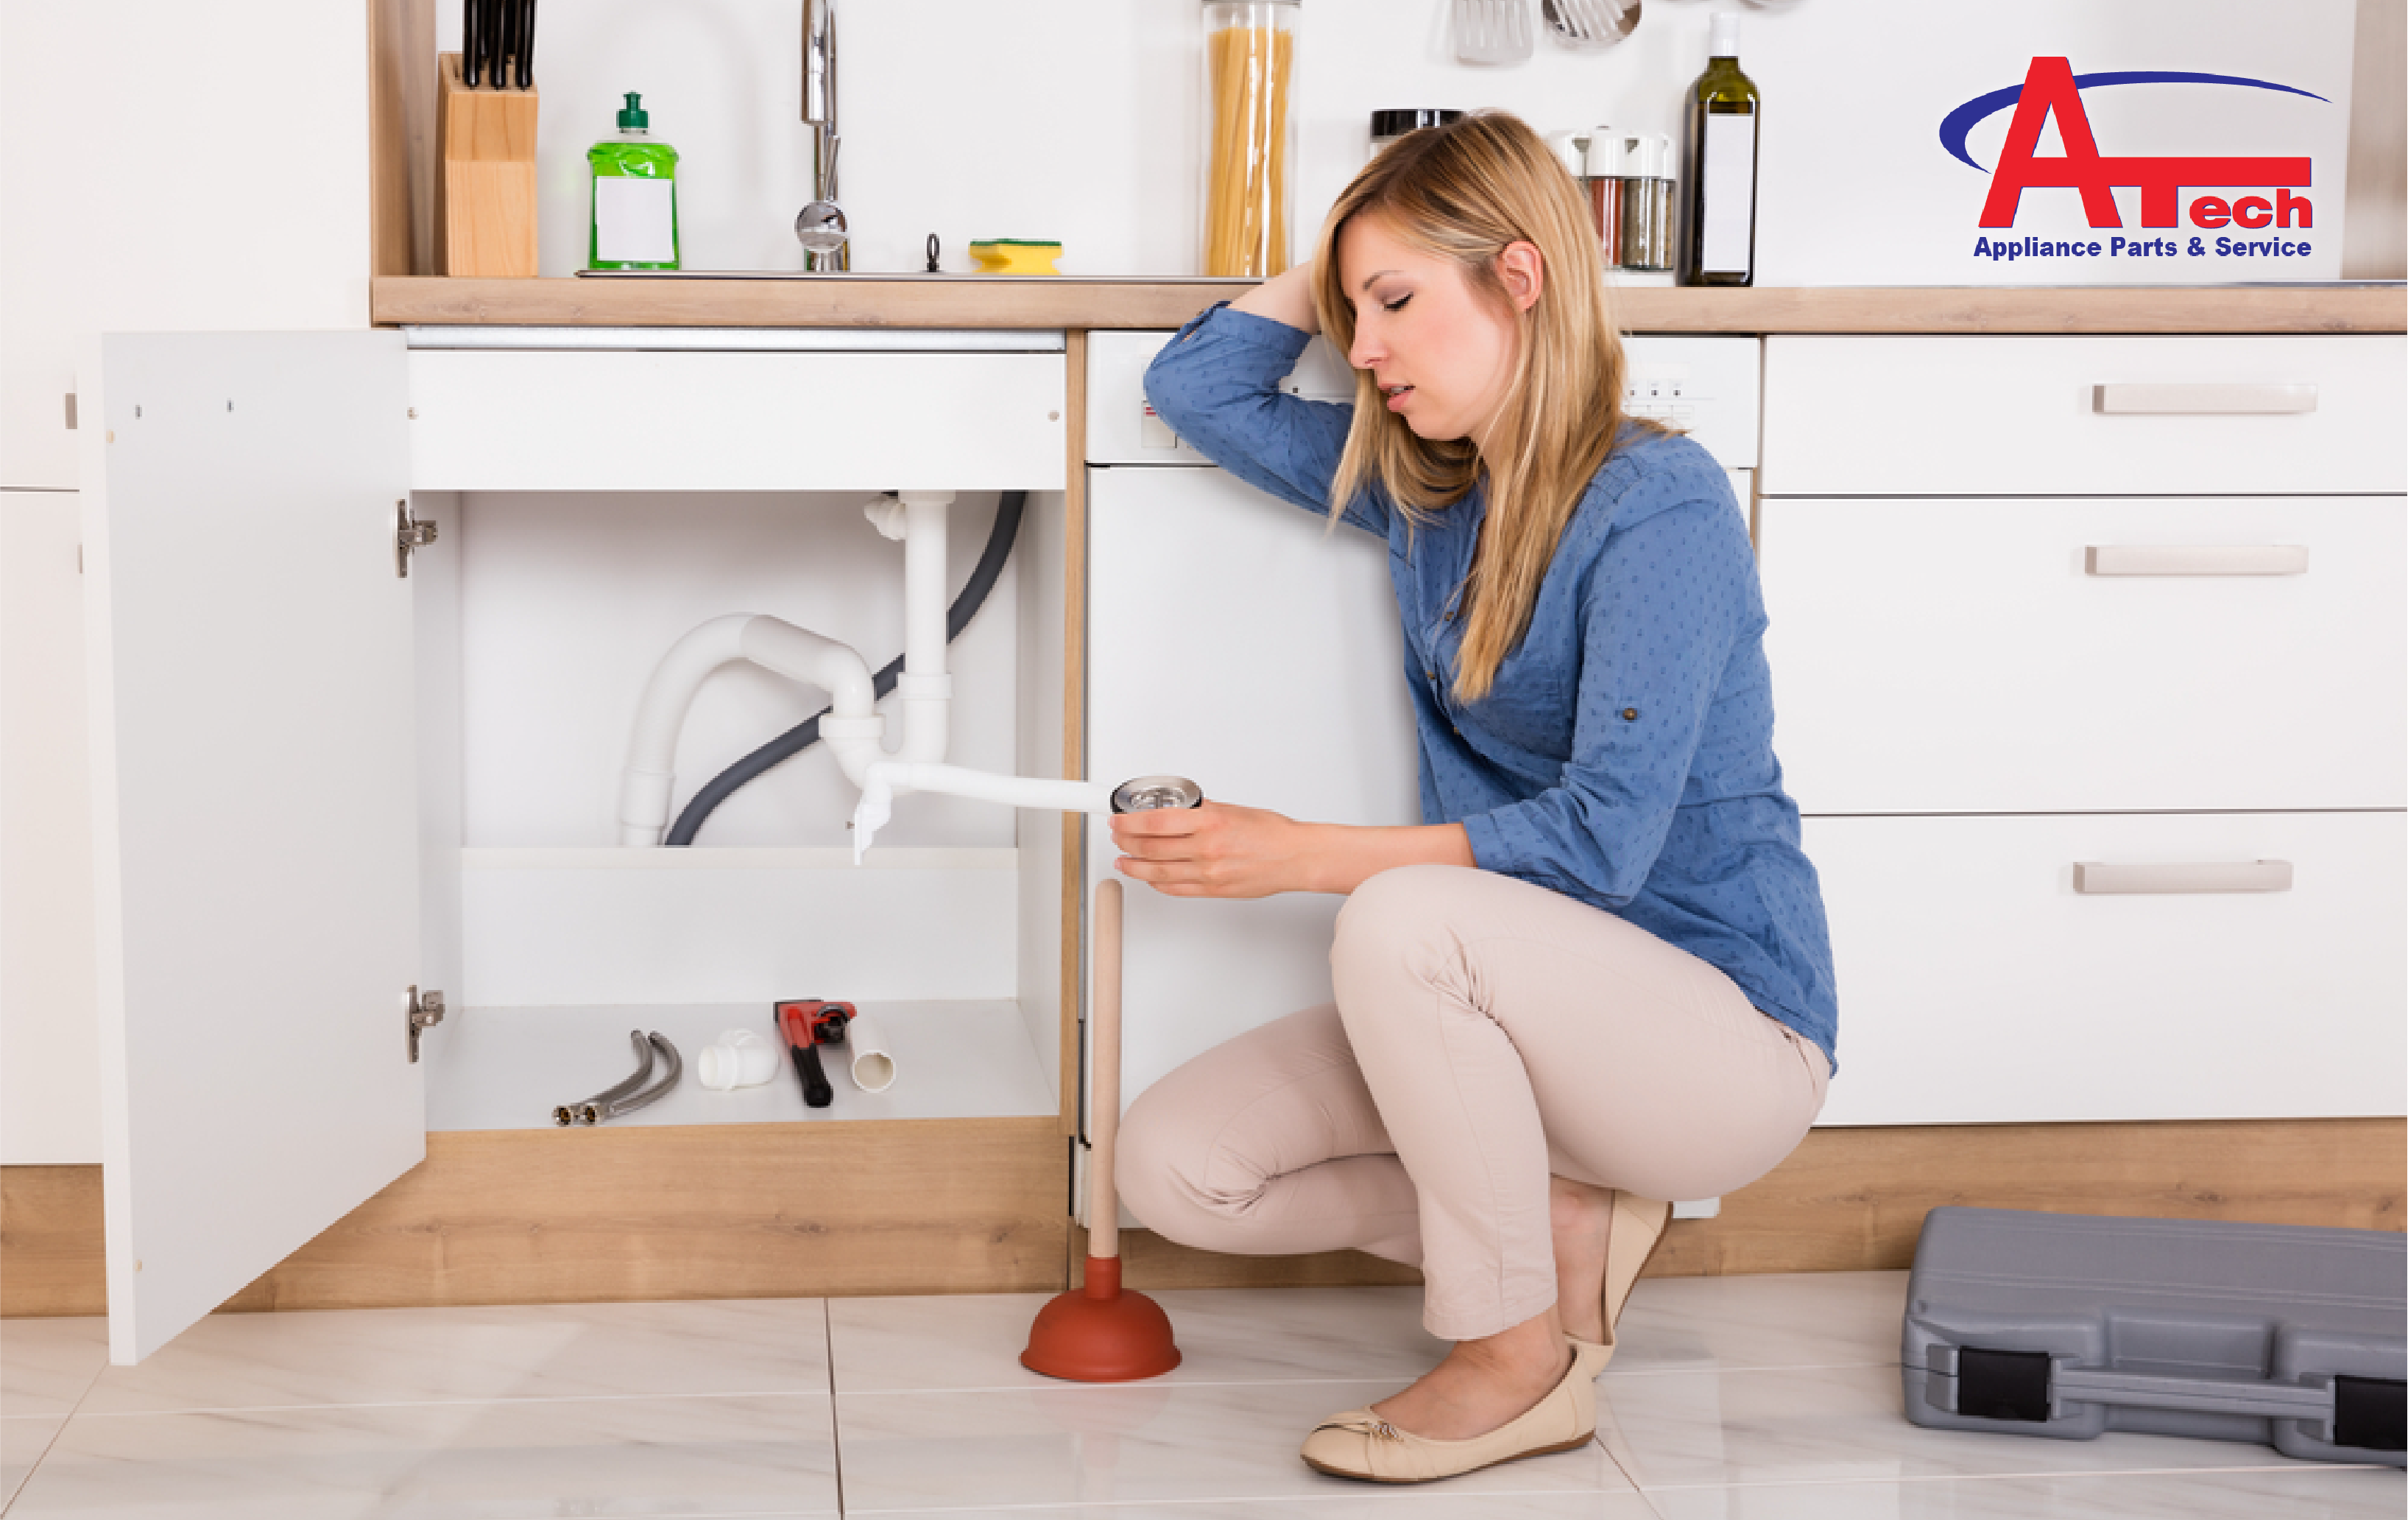 Appliances Need Maintenance